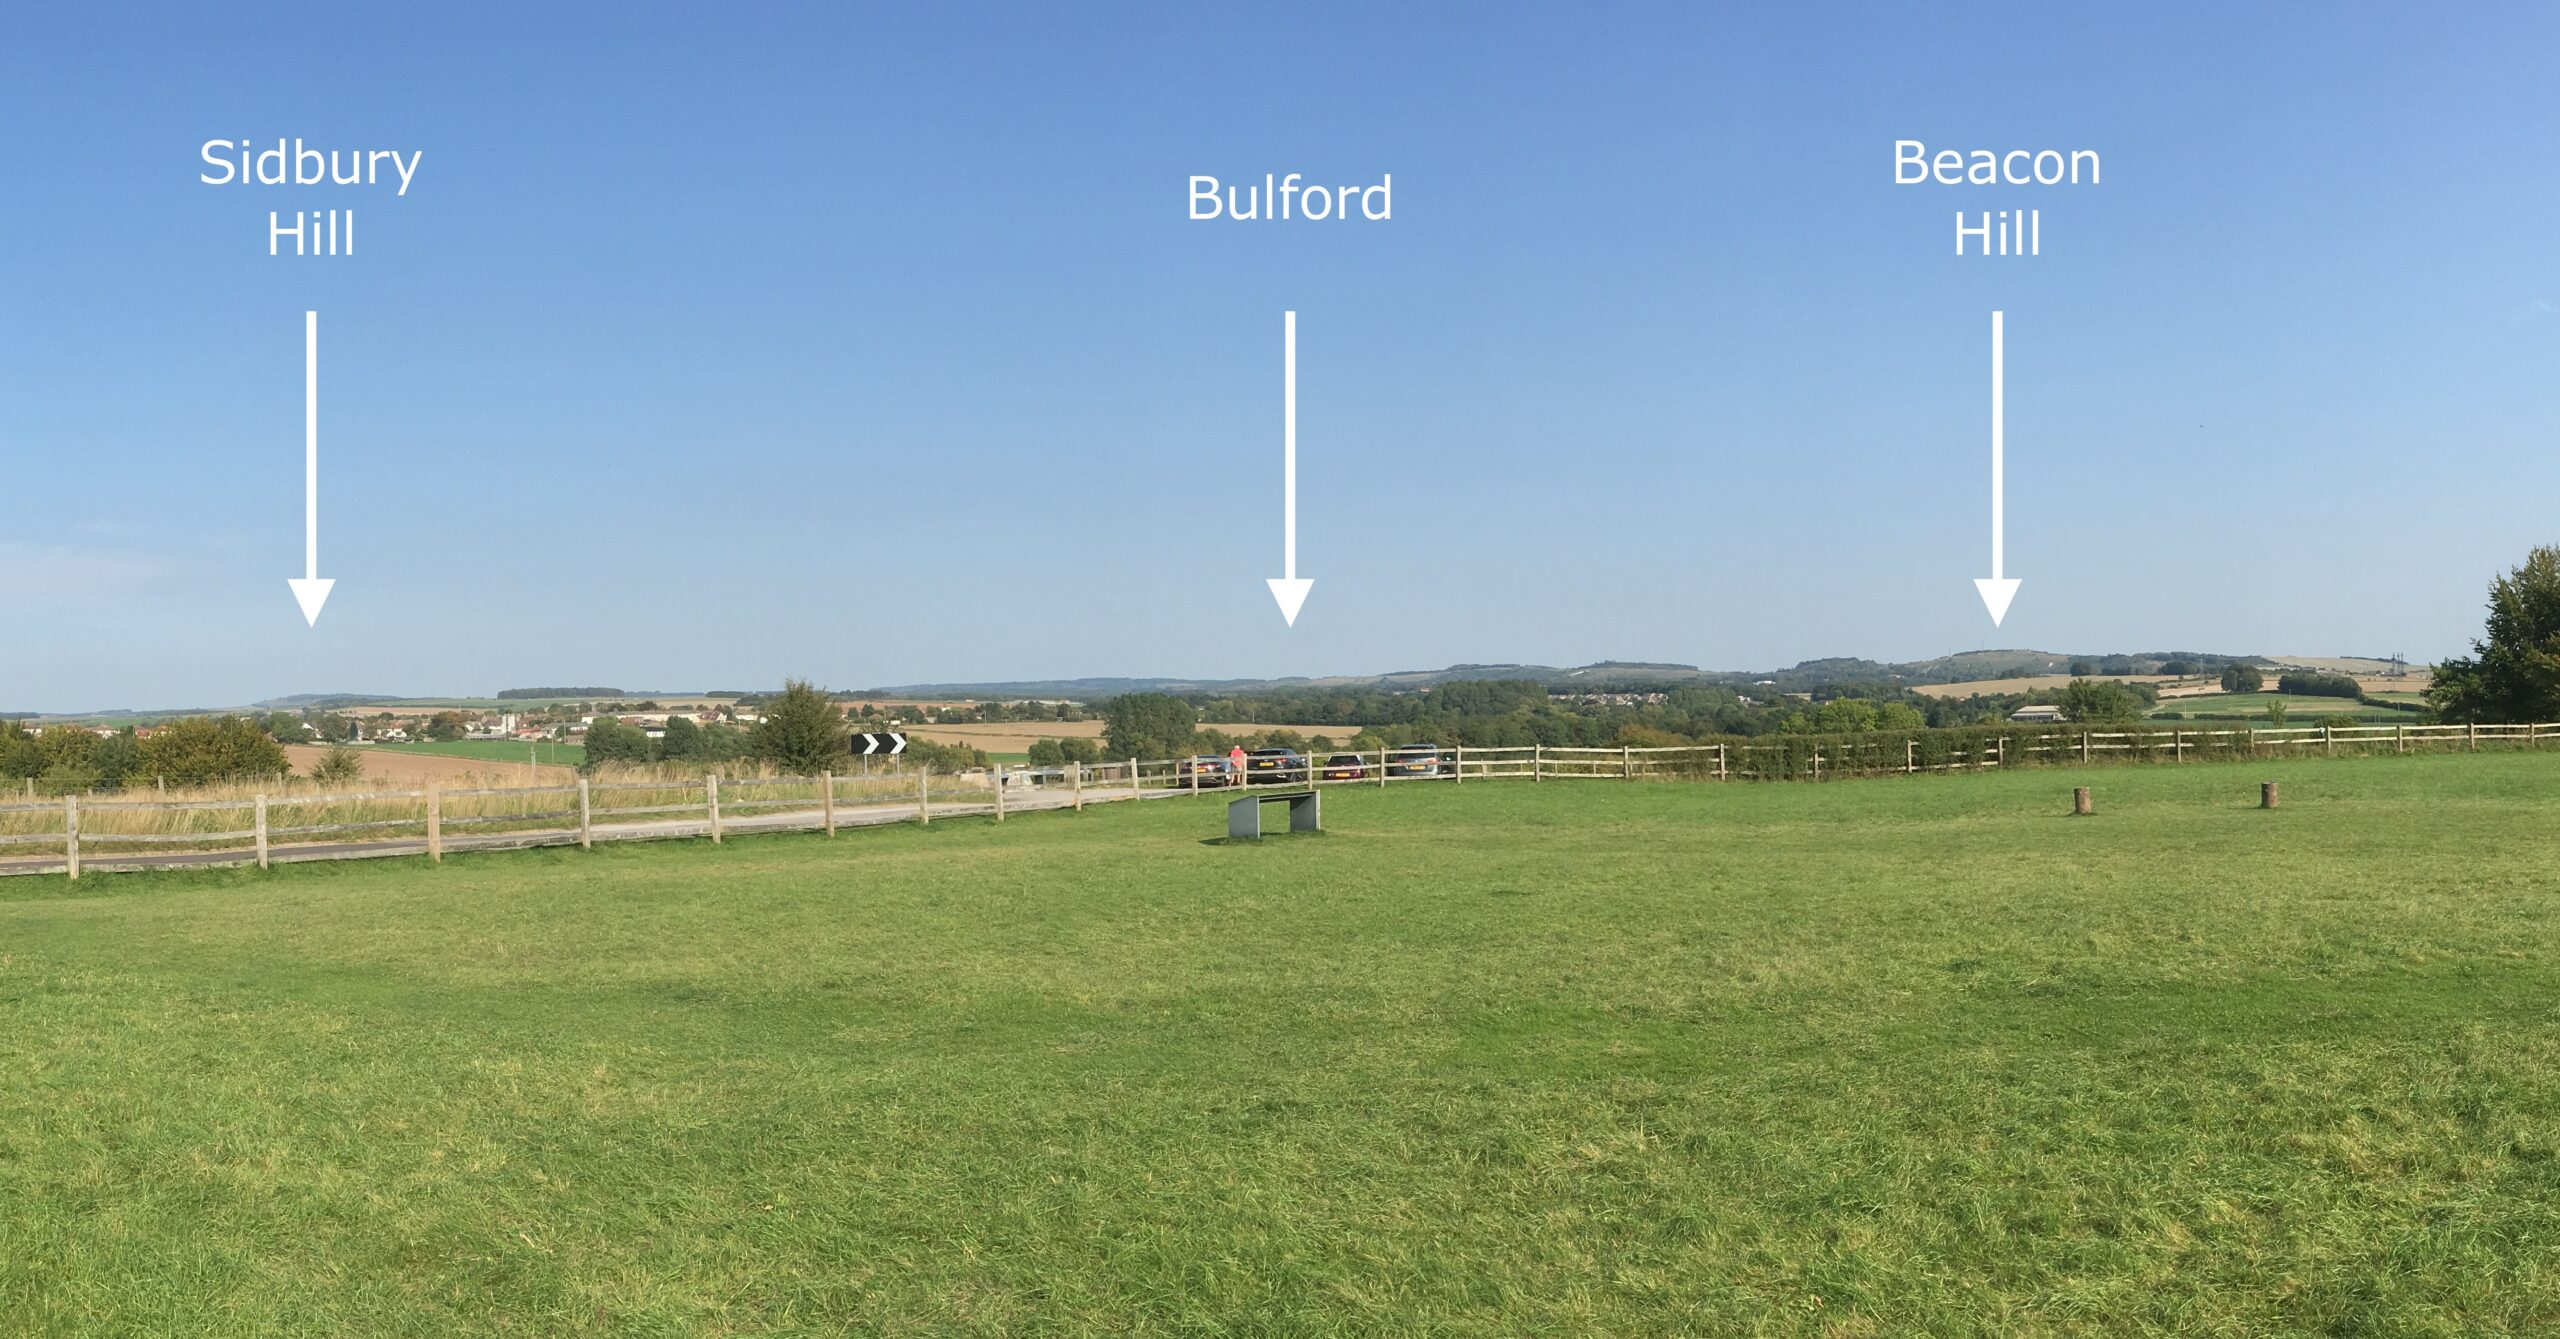 Woodhenge Eastern Horizon: Bulford and Beacon Hill